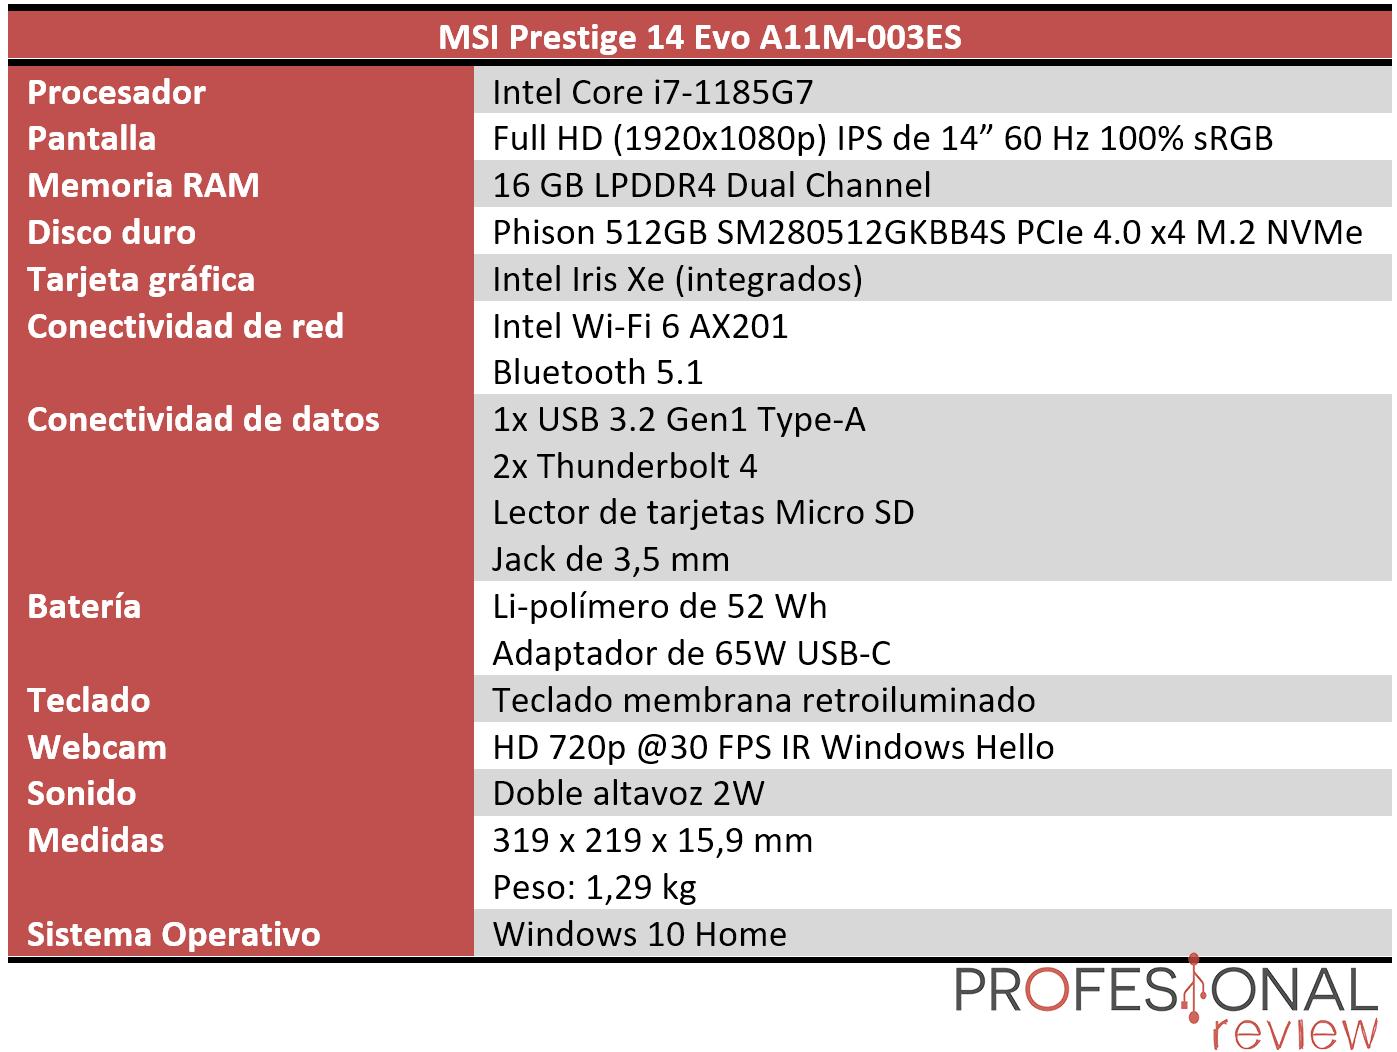 MSI Prestige 14 Evo Características